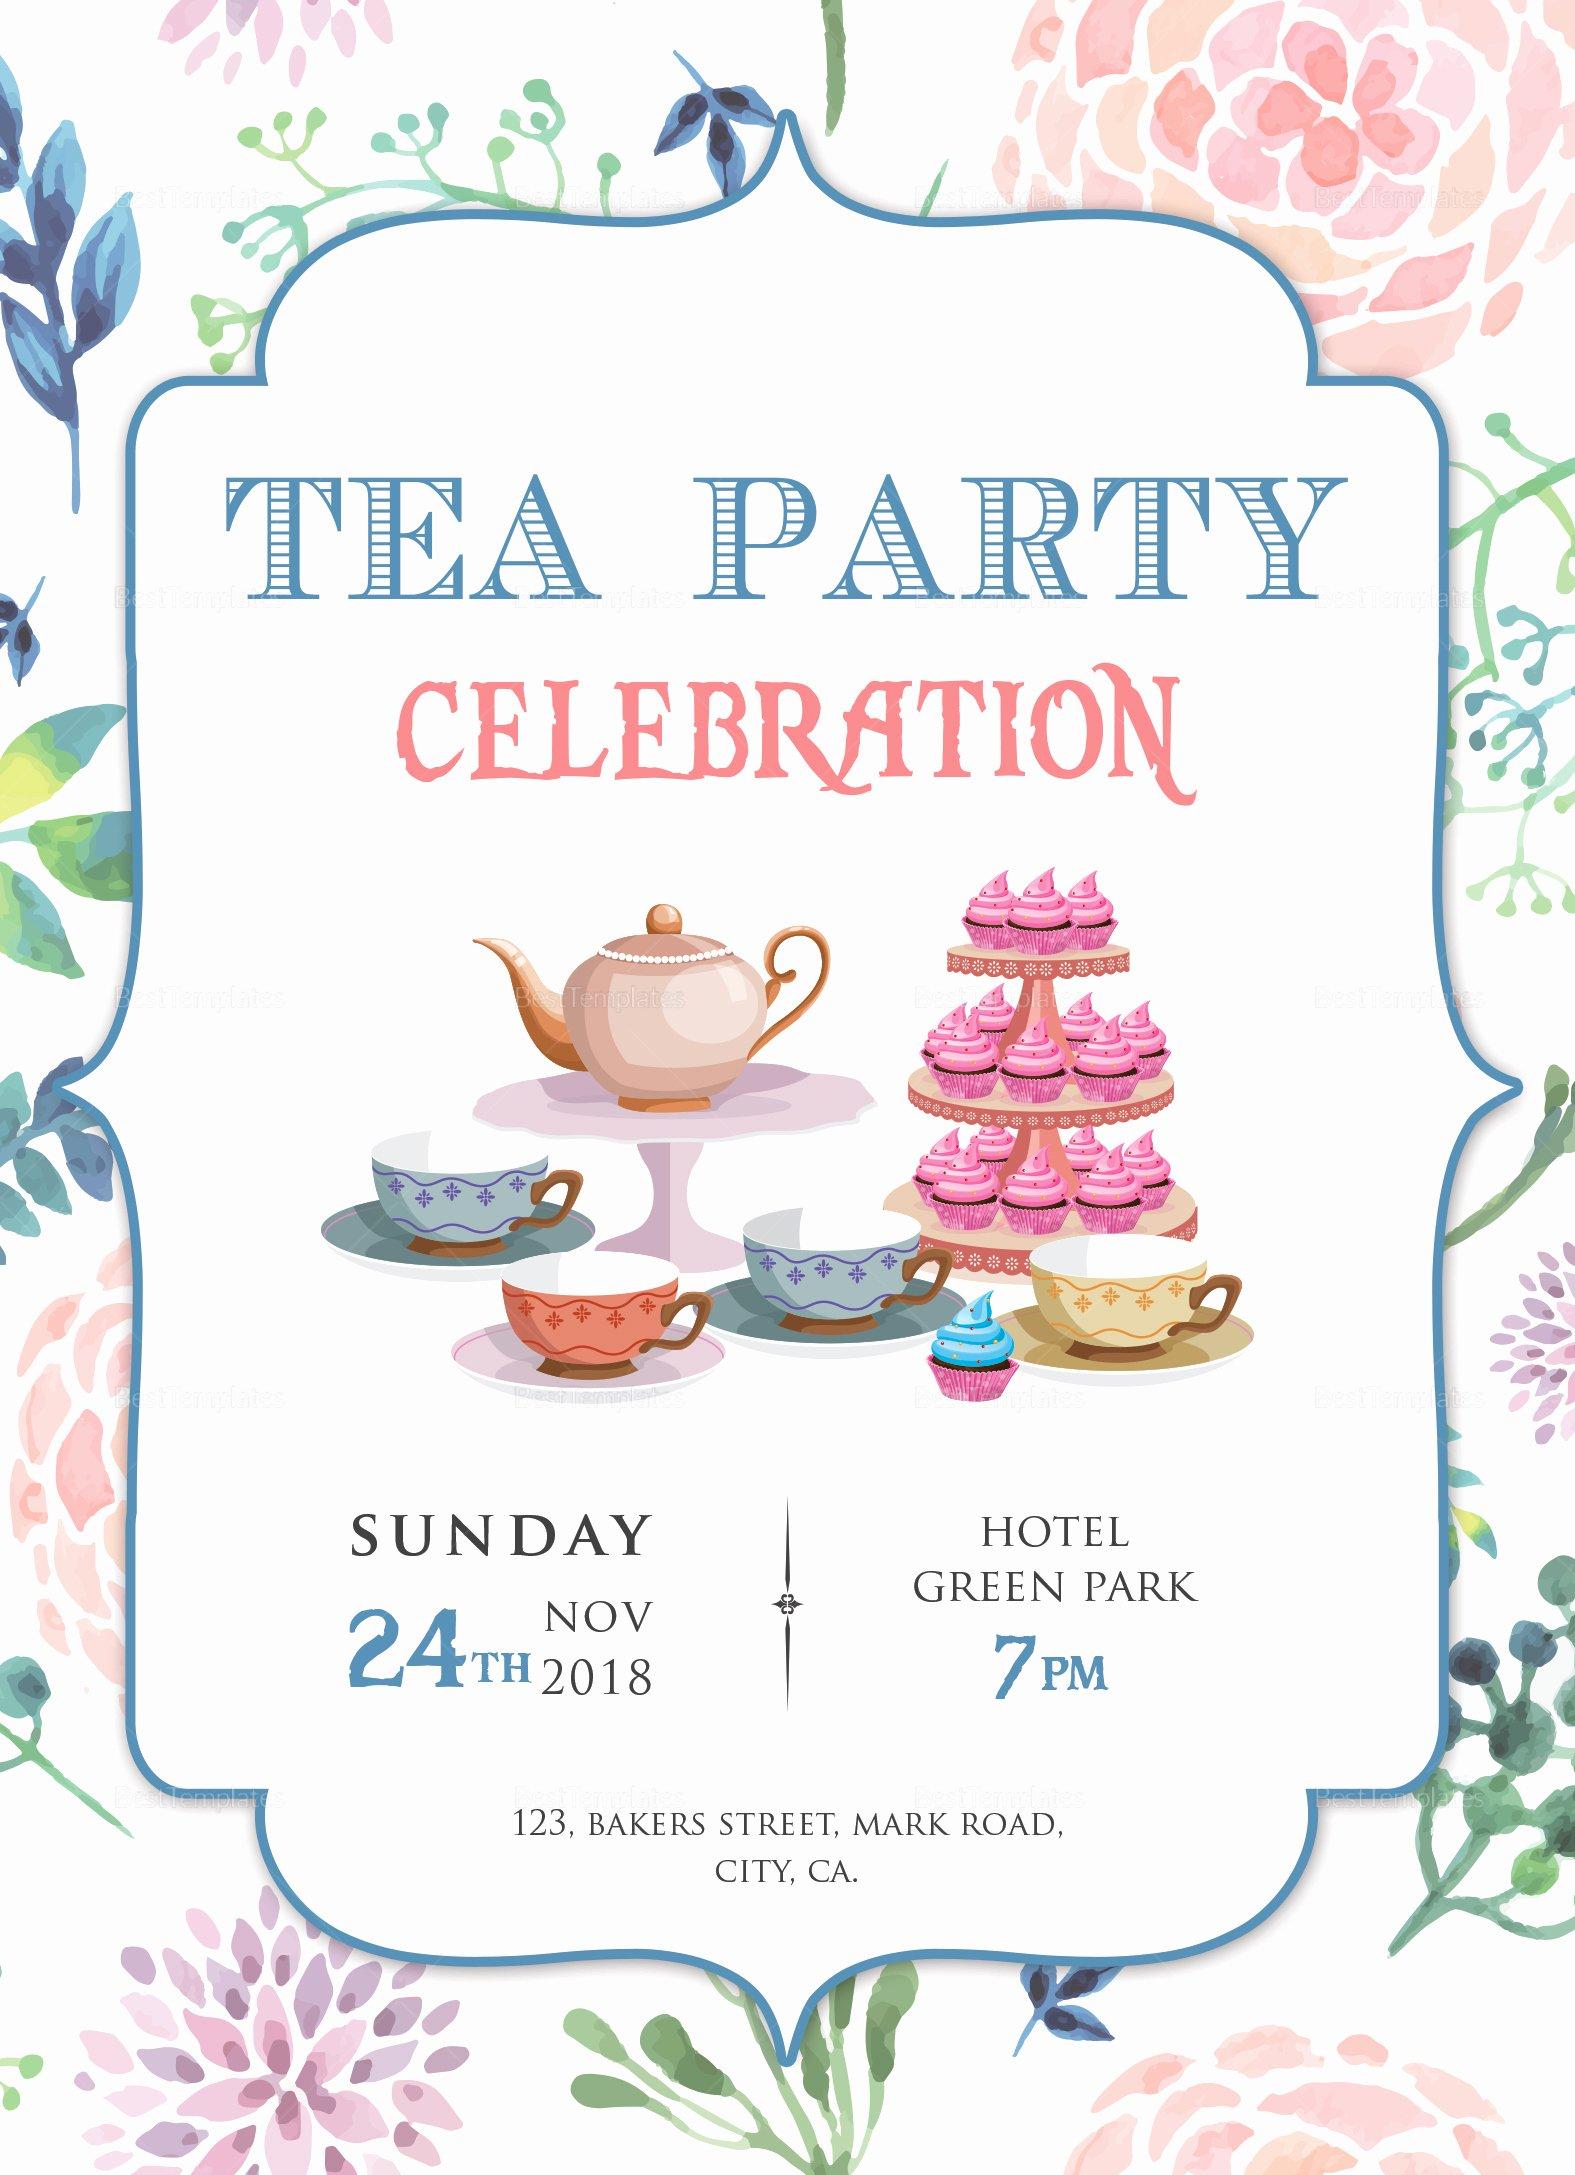 Tea Party Invitation Template Lovely Elegant Tea Party Invitation Design Template In Word Psd